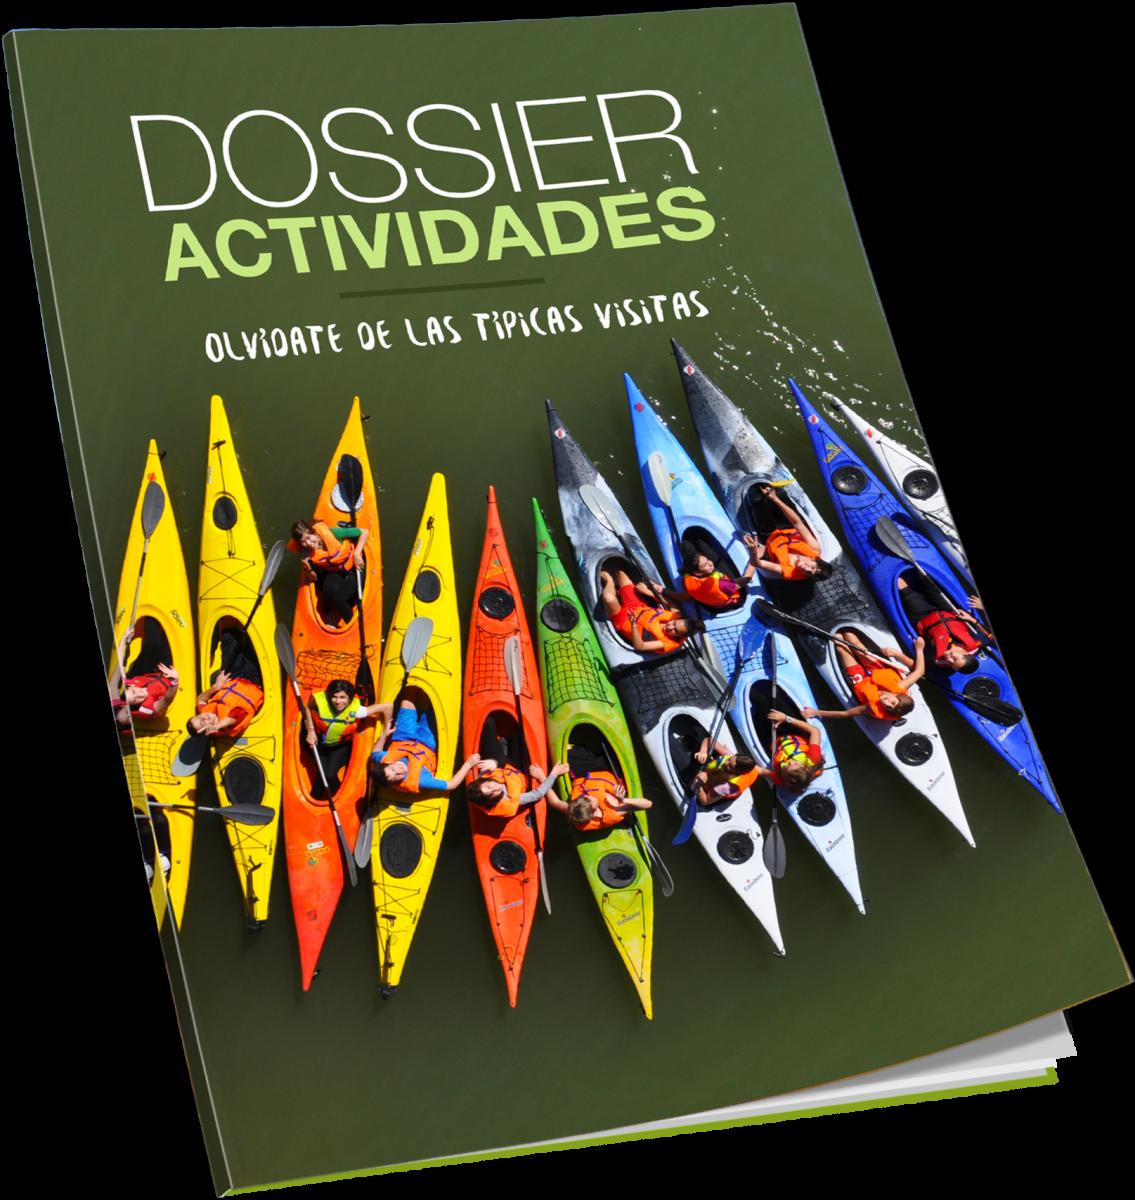 Dossier de actividades